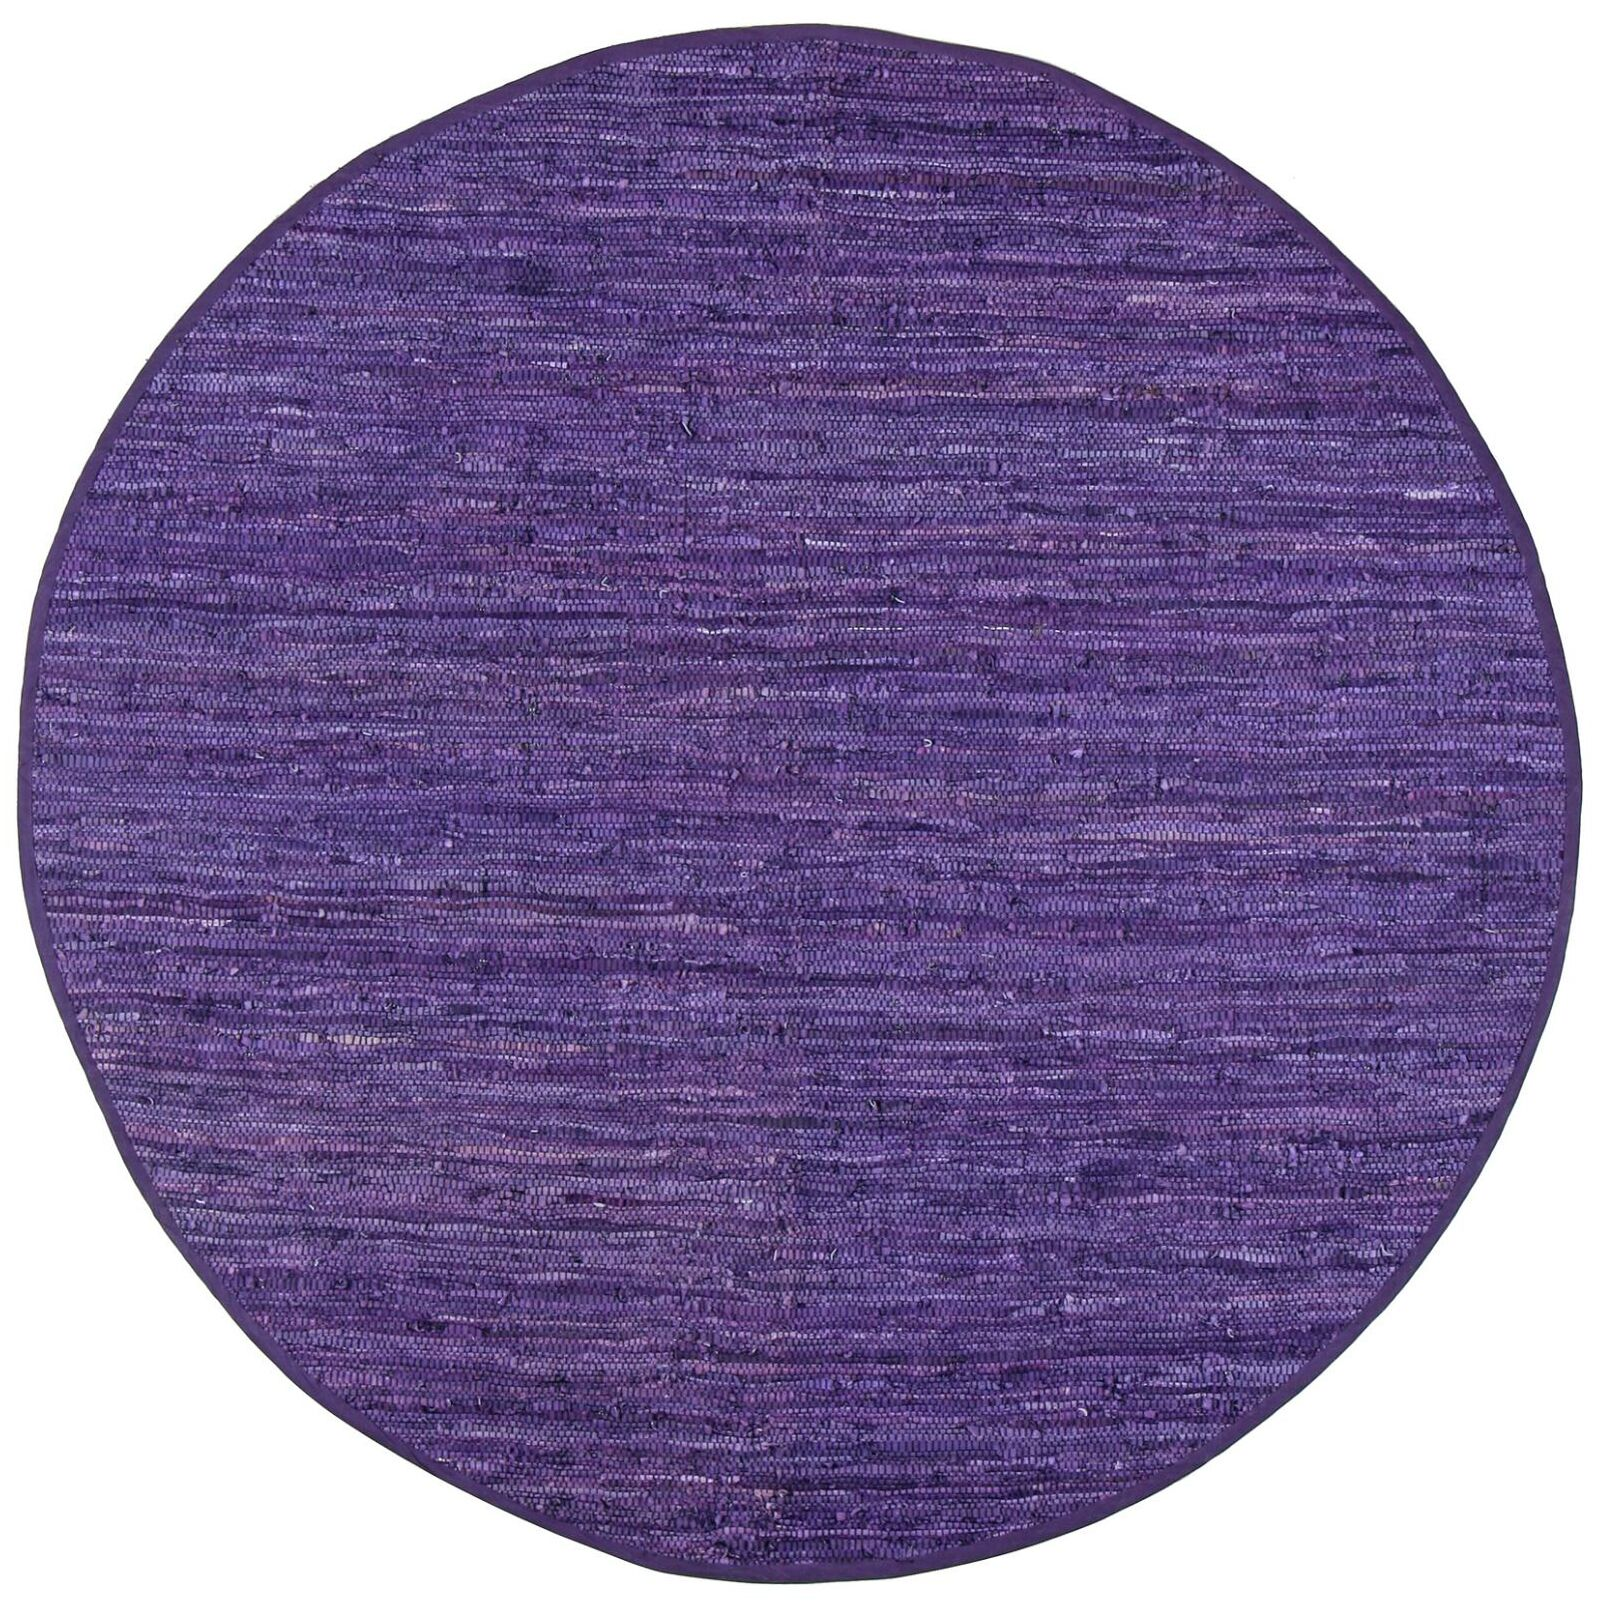 Sandford Chindi Hand Woven Cotton Purple Area Rug Rug Size: Round 6'